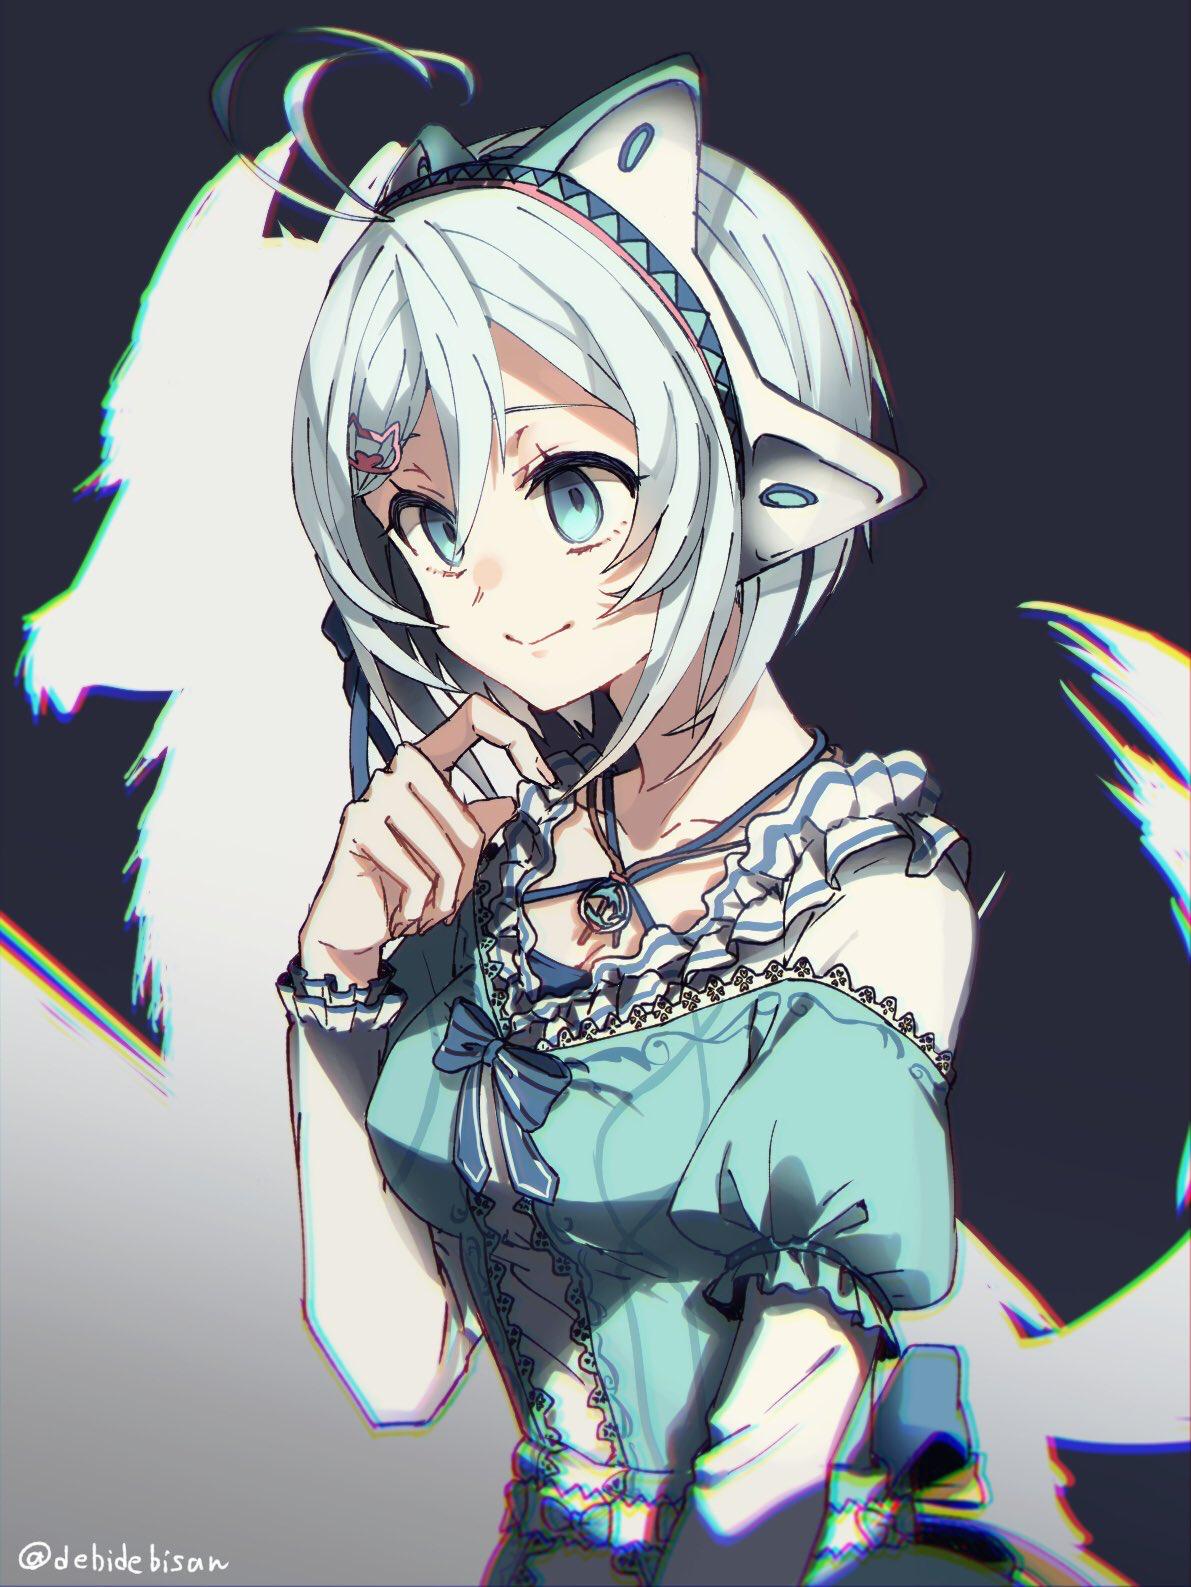 Pin by EpsiWolf on Anime Anime neko, Anime, Furry girls